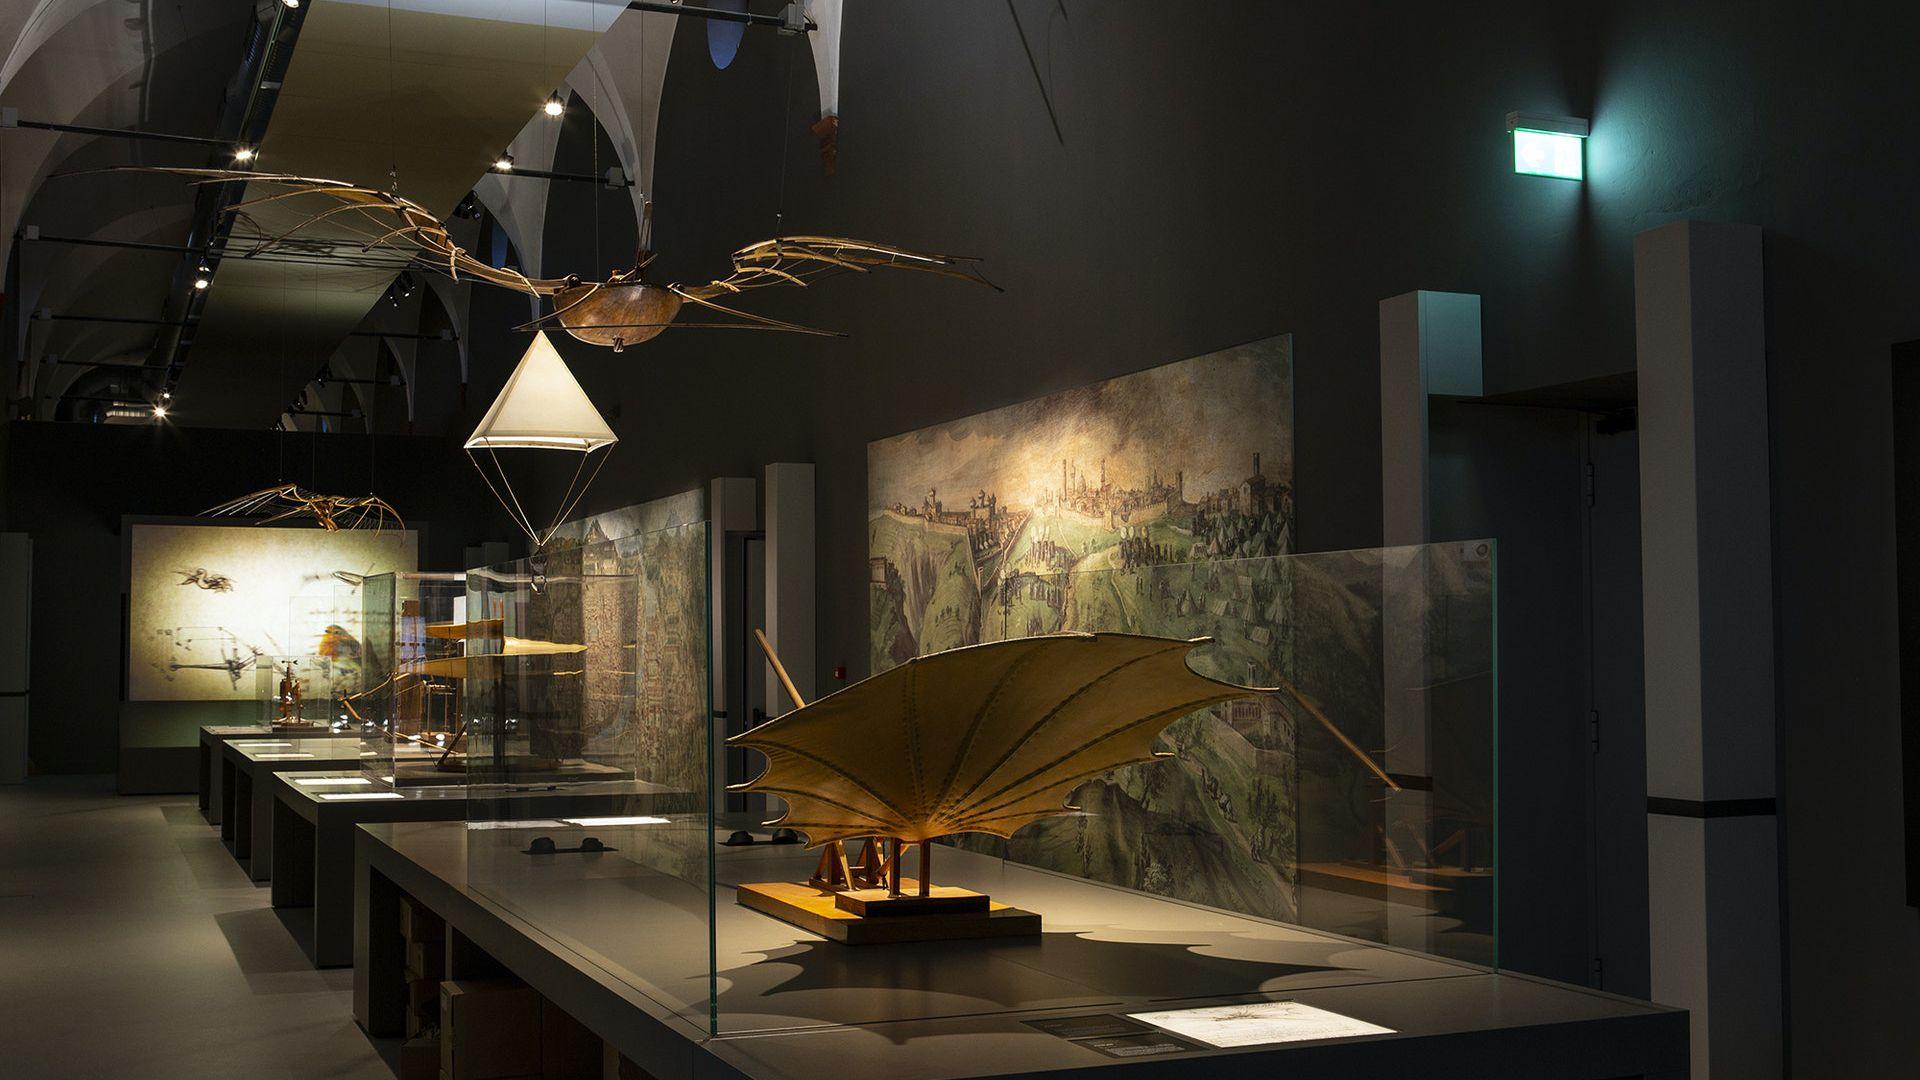 Museum Science and Technology Leonardo da Vinci: Fast Track